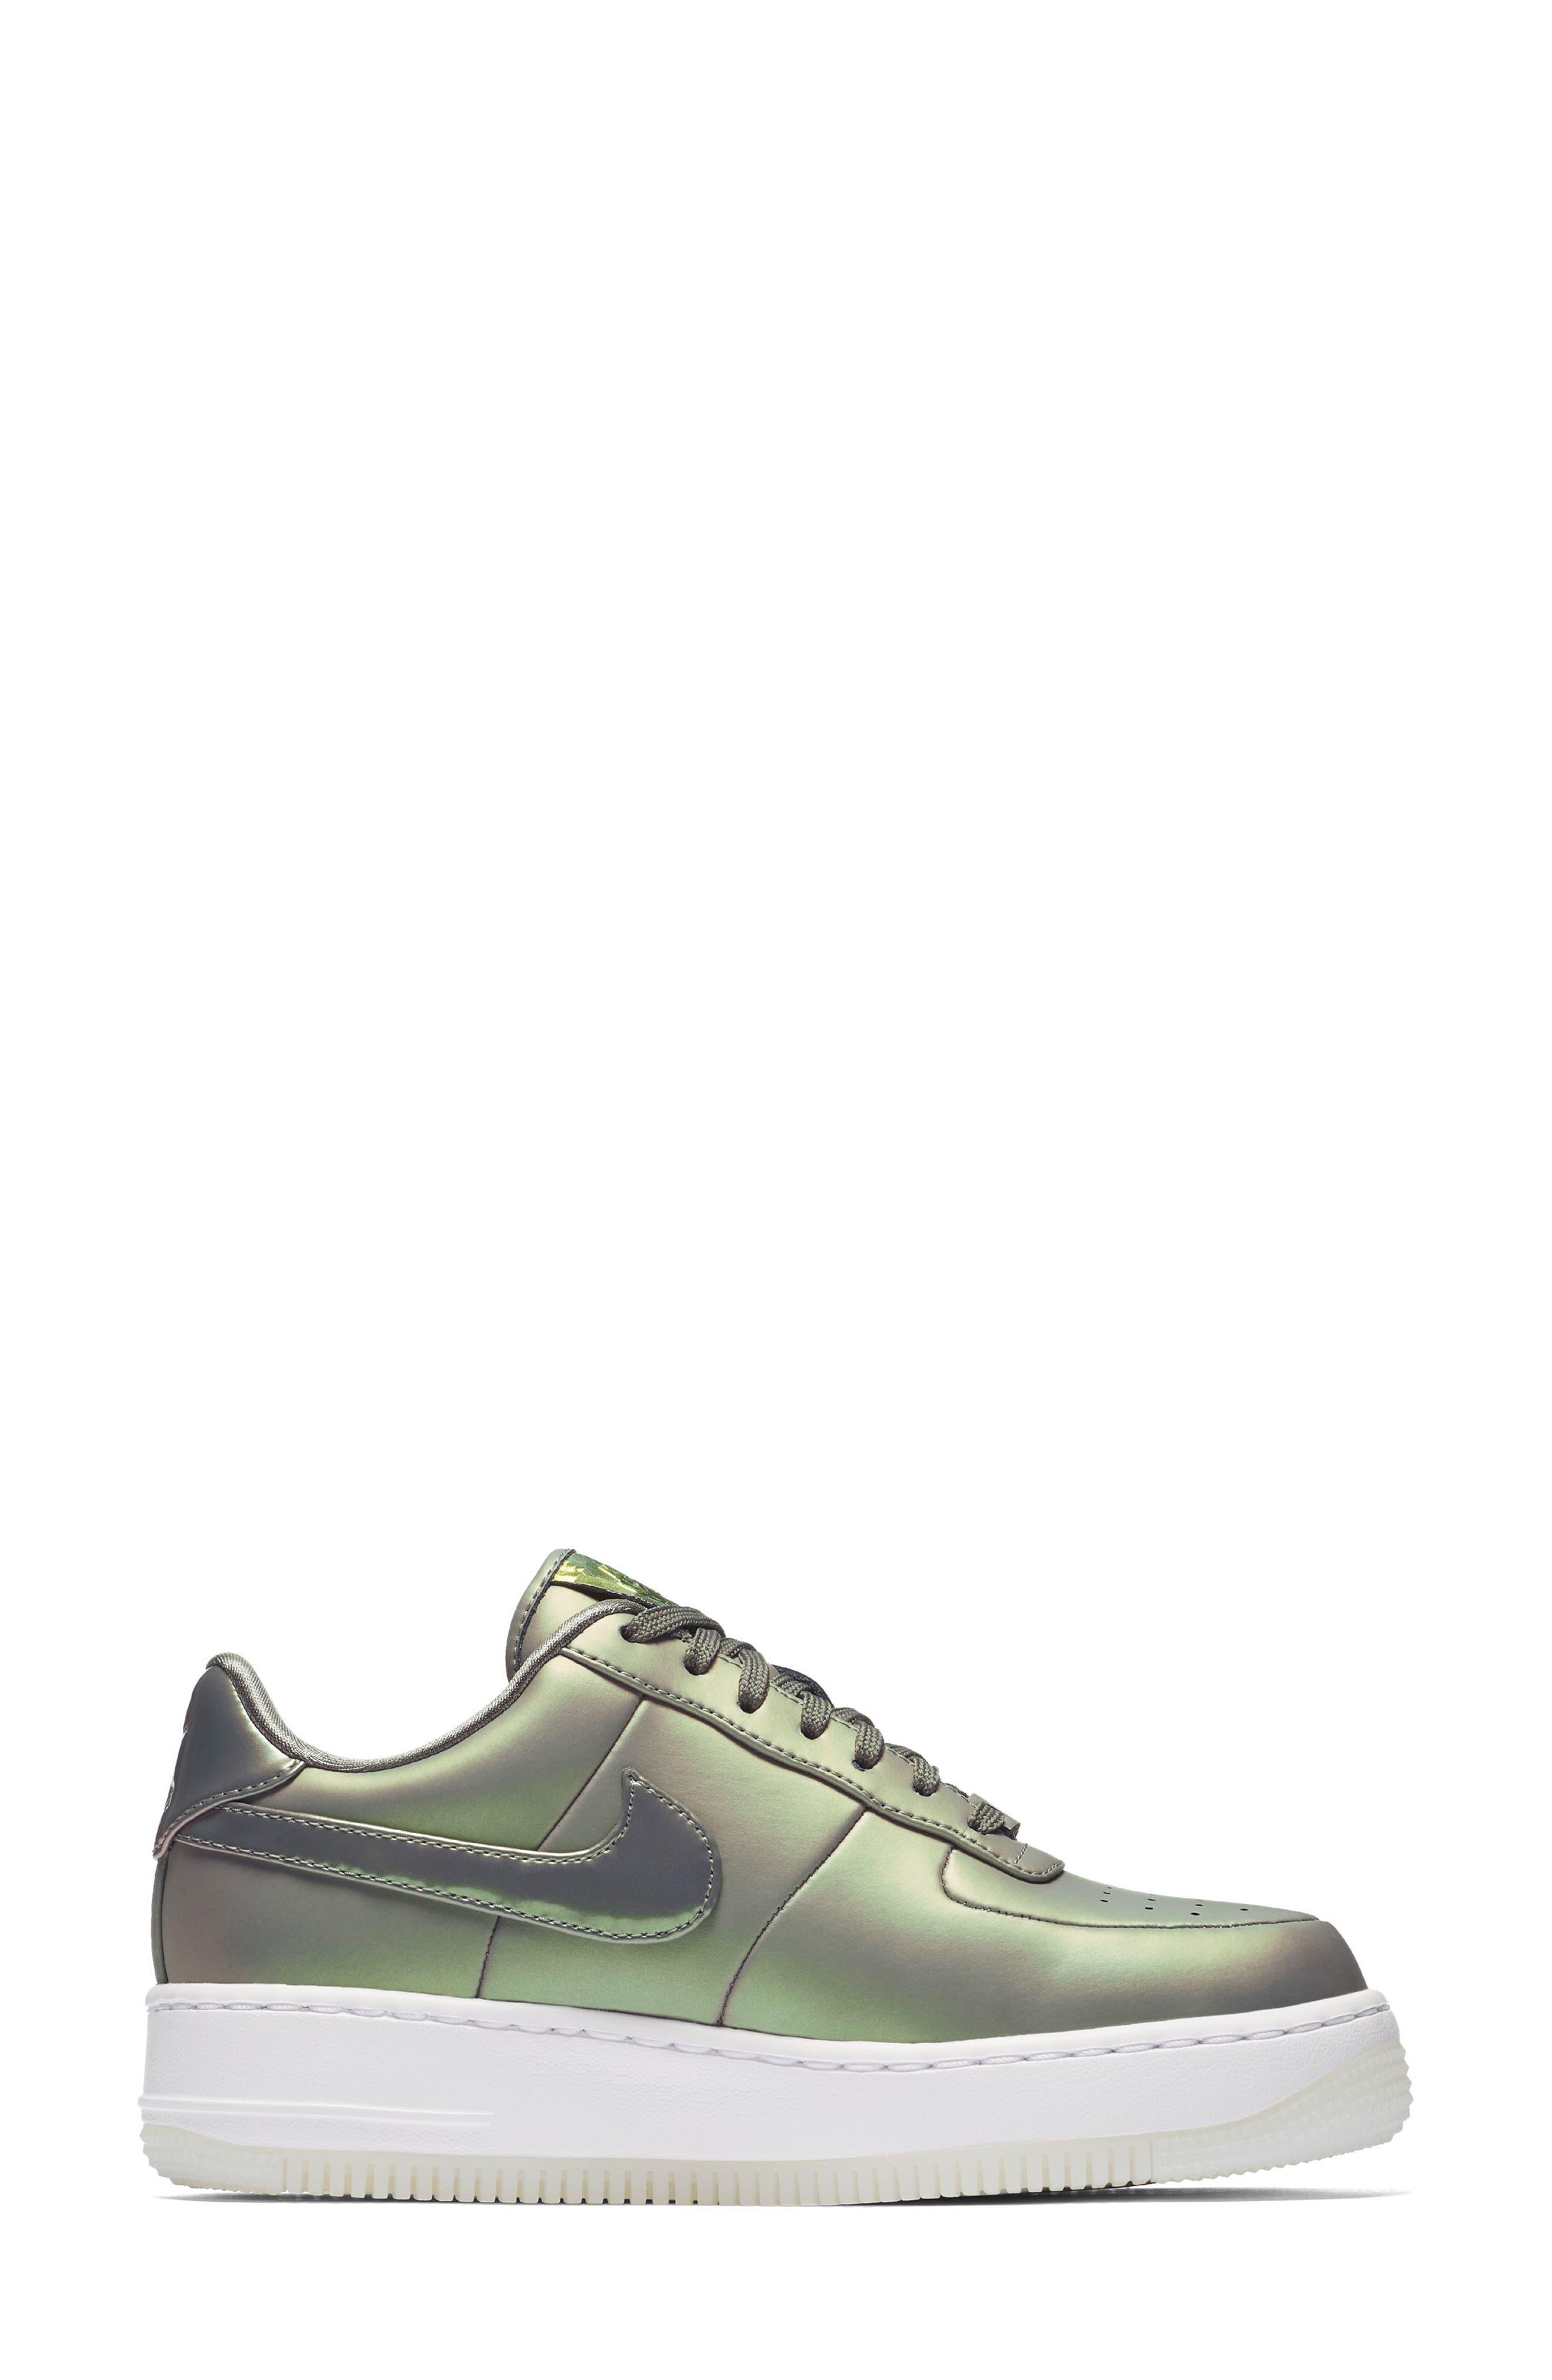 Air Force 1 Upstep Premium LX Shoe,                             Alternate thumbnail 3, color,                             252